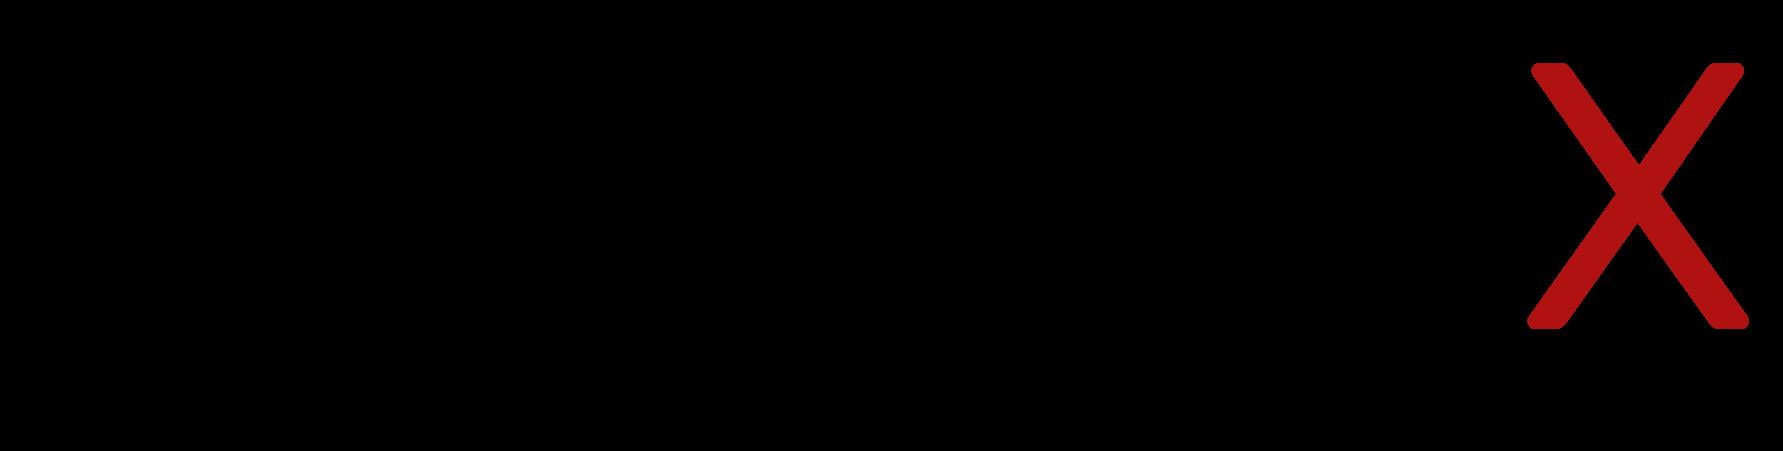 Austrinox